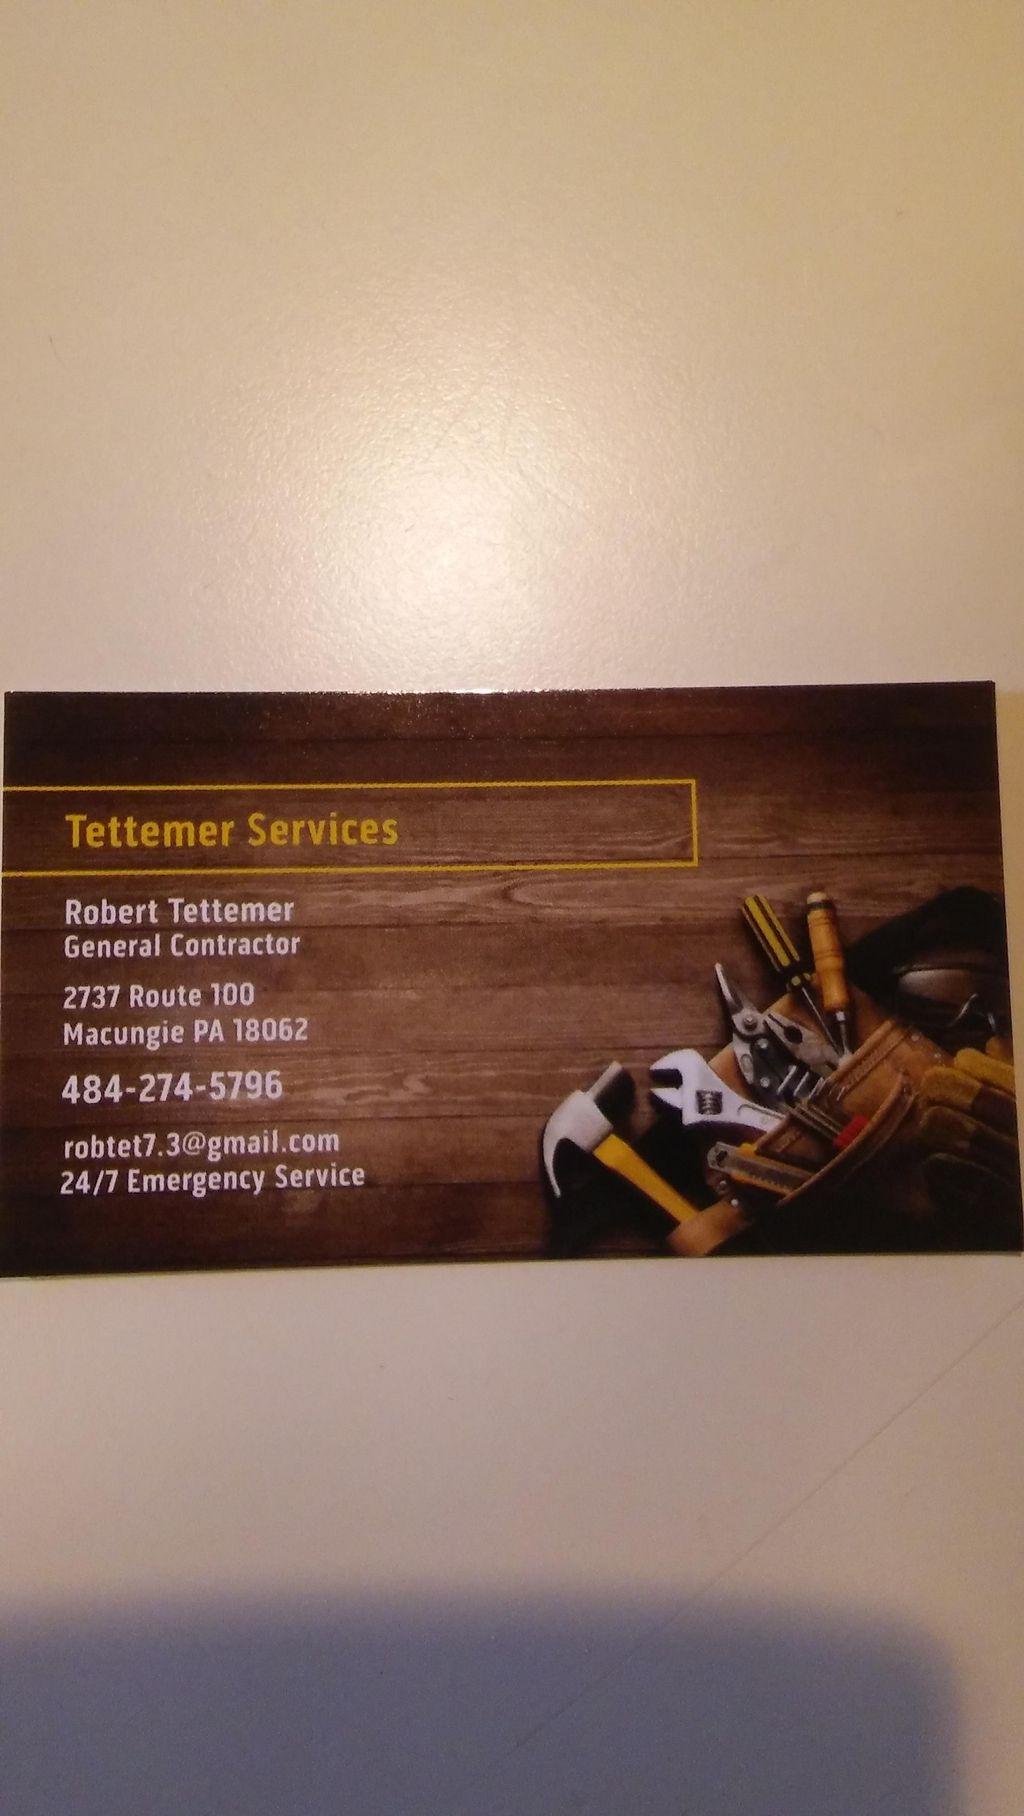 Tettemer Services